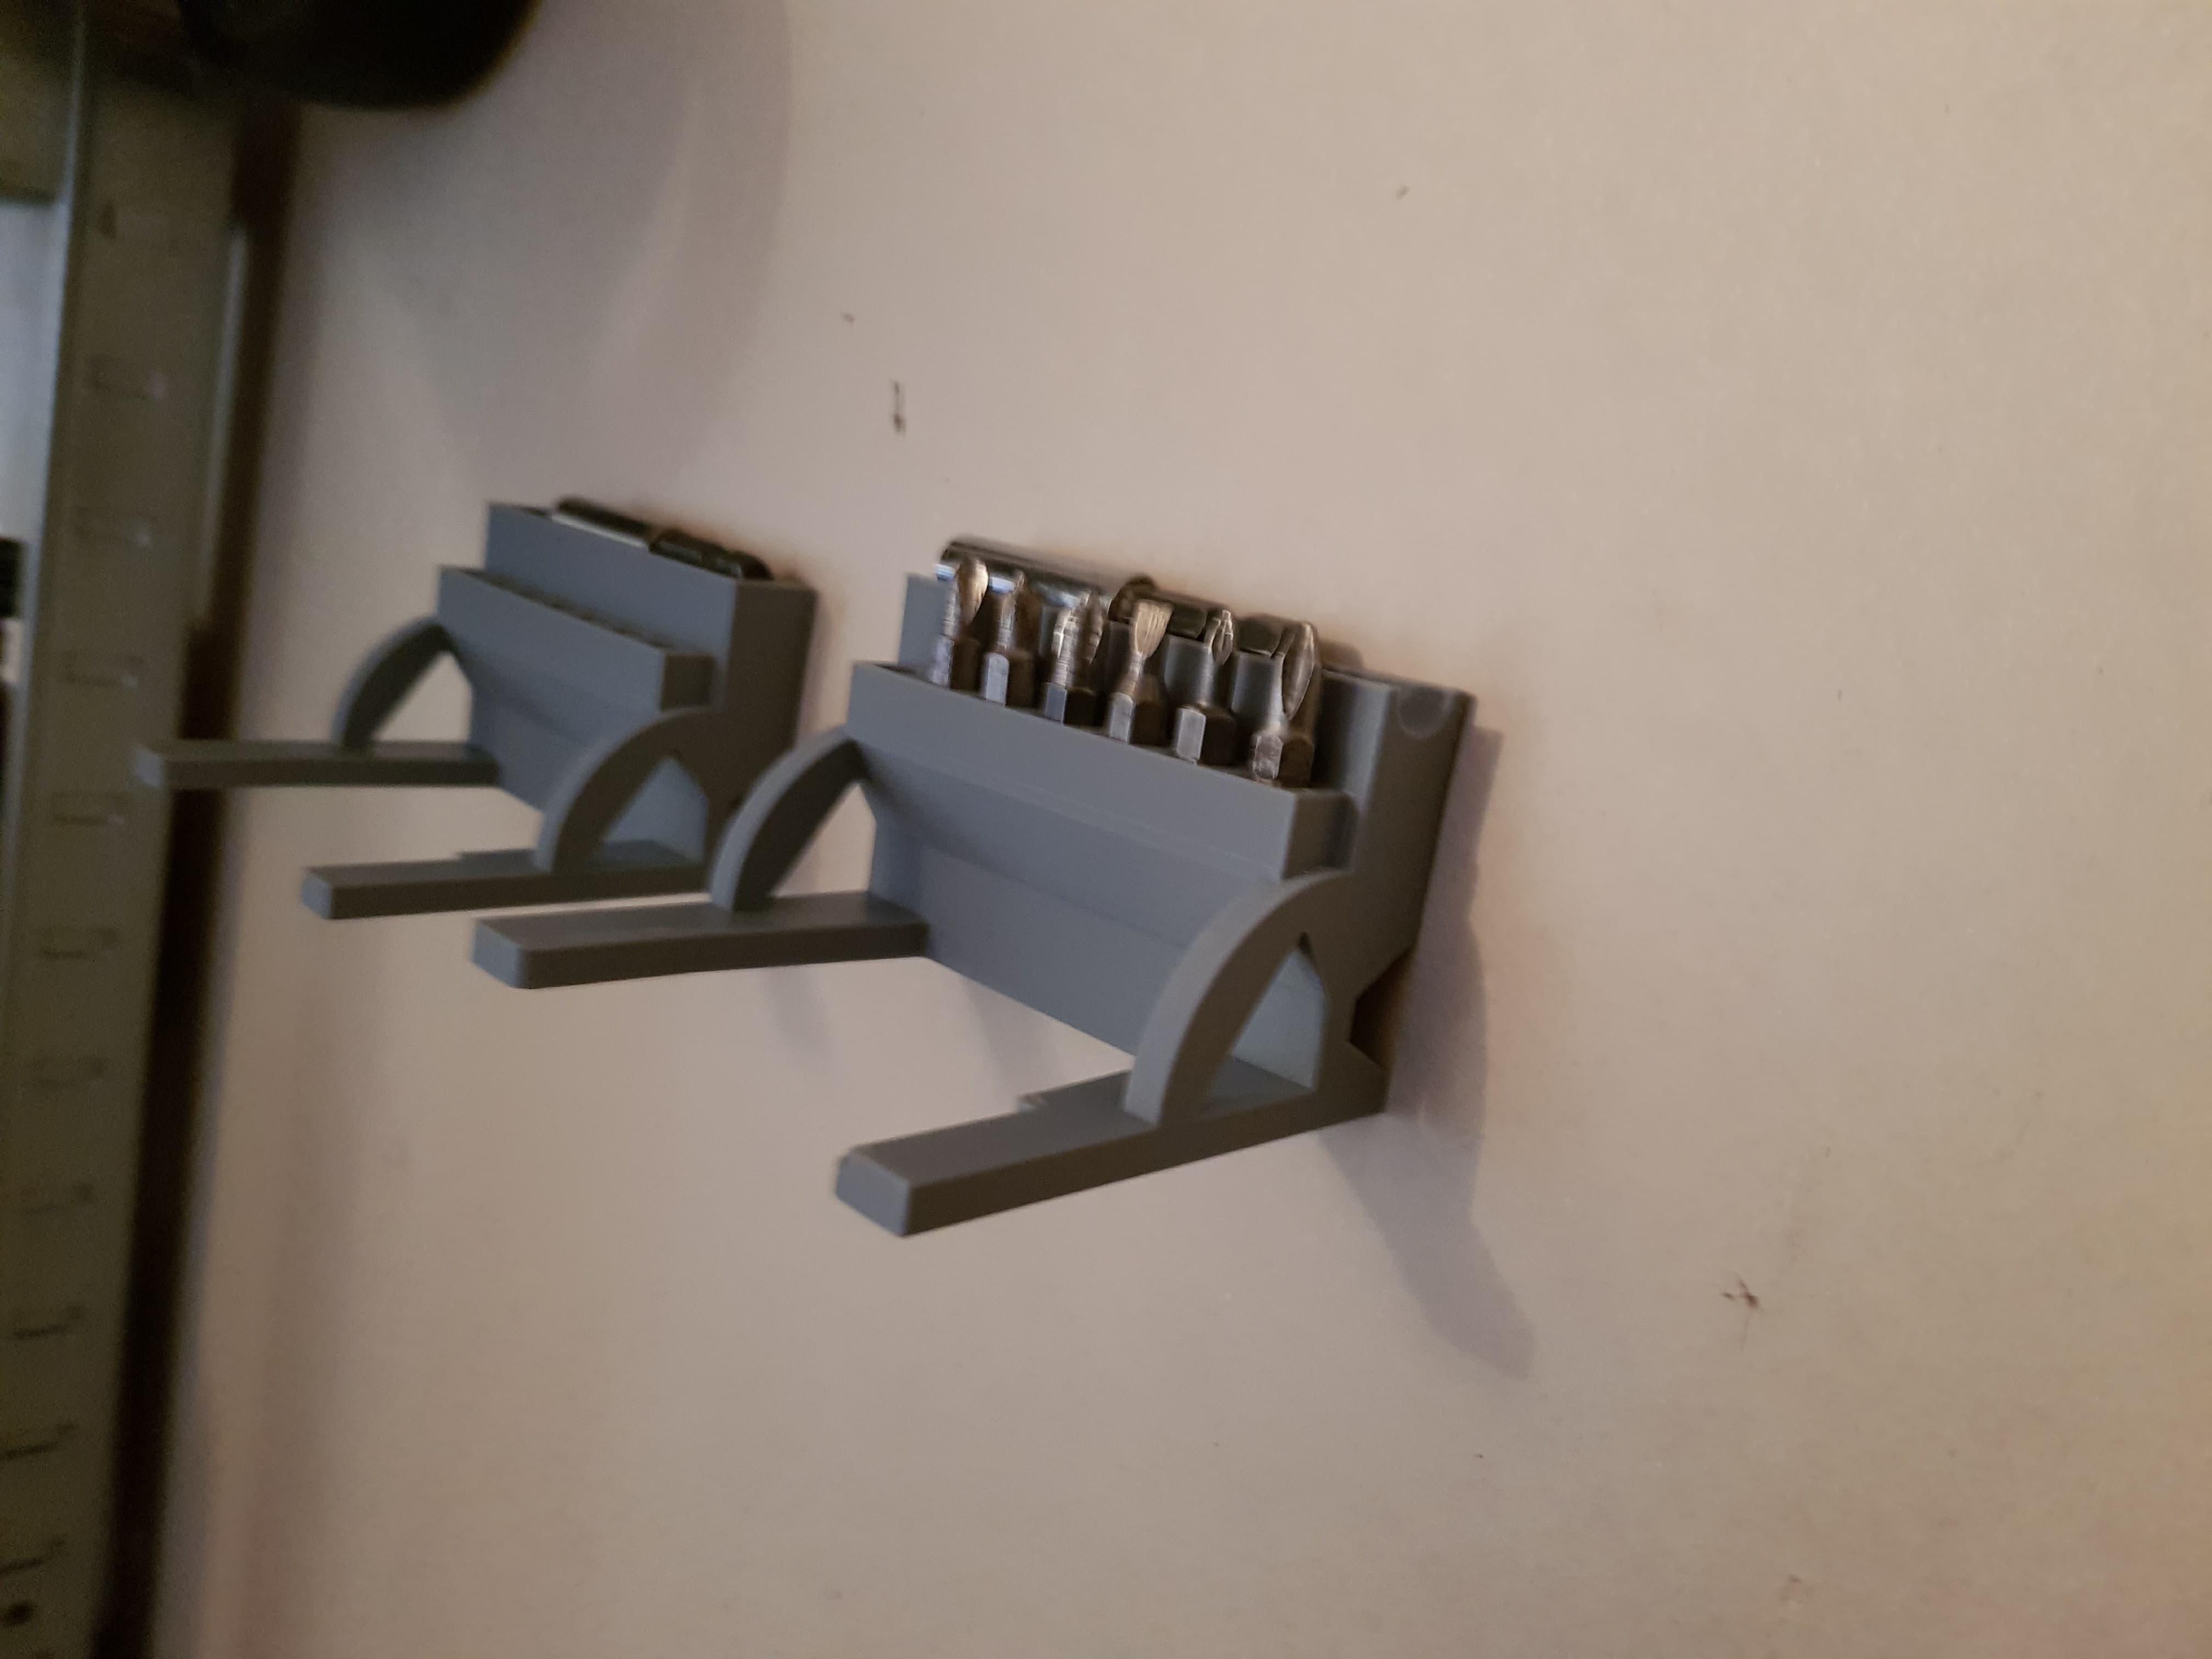 28548010_398526747240979_1018545909_o.jpg Download free STL file AEG BATTERY DOOR • 3D printer object, MME